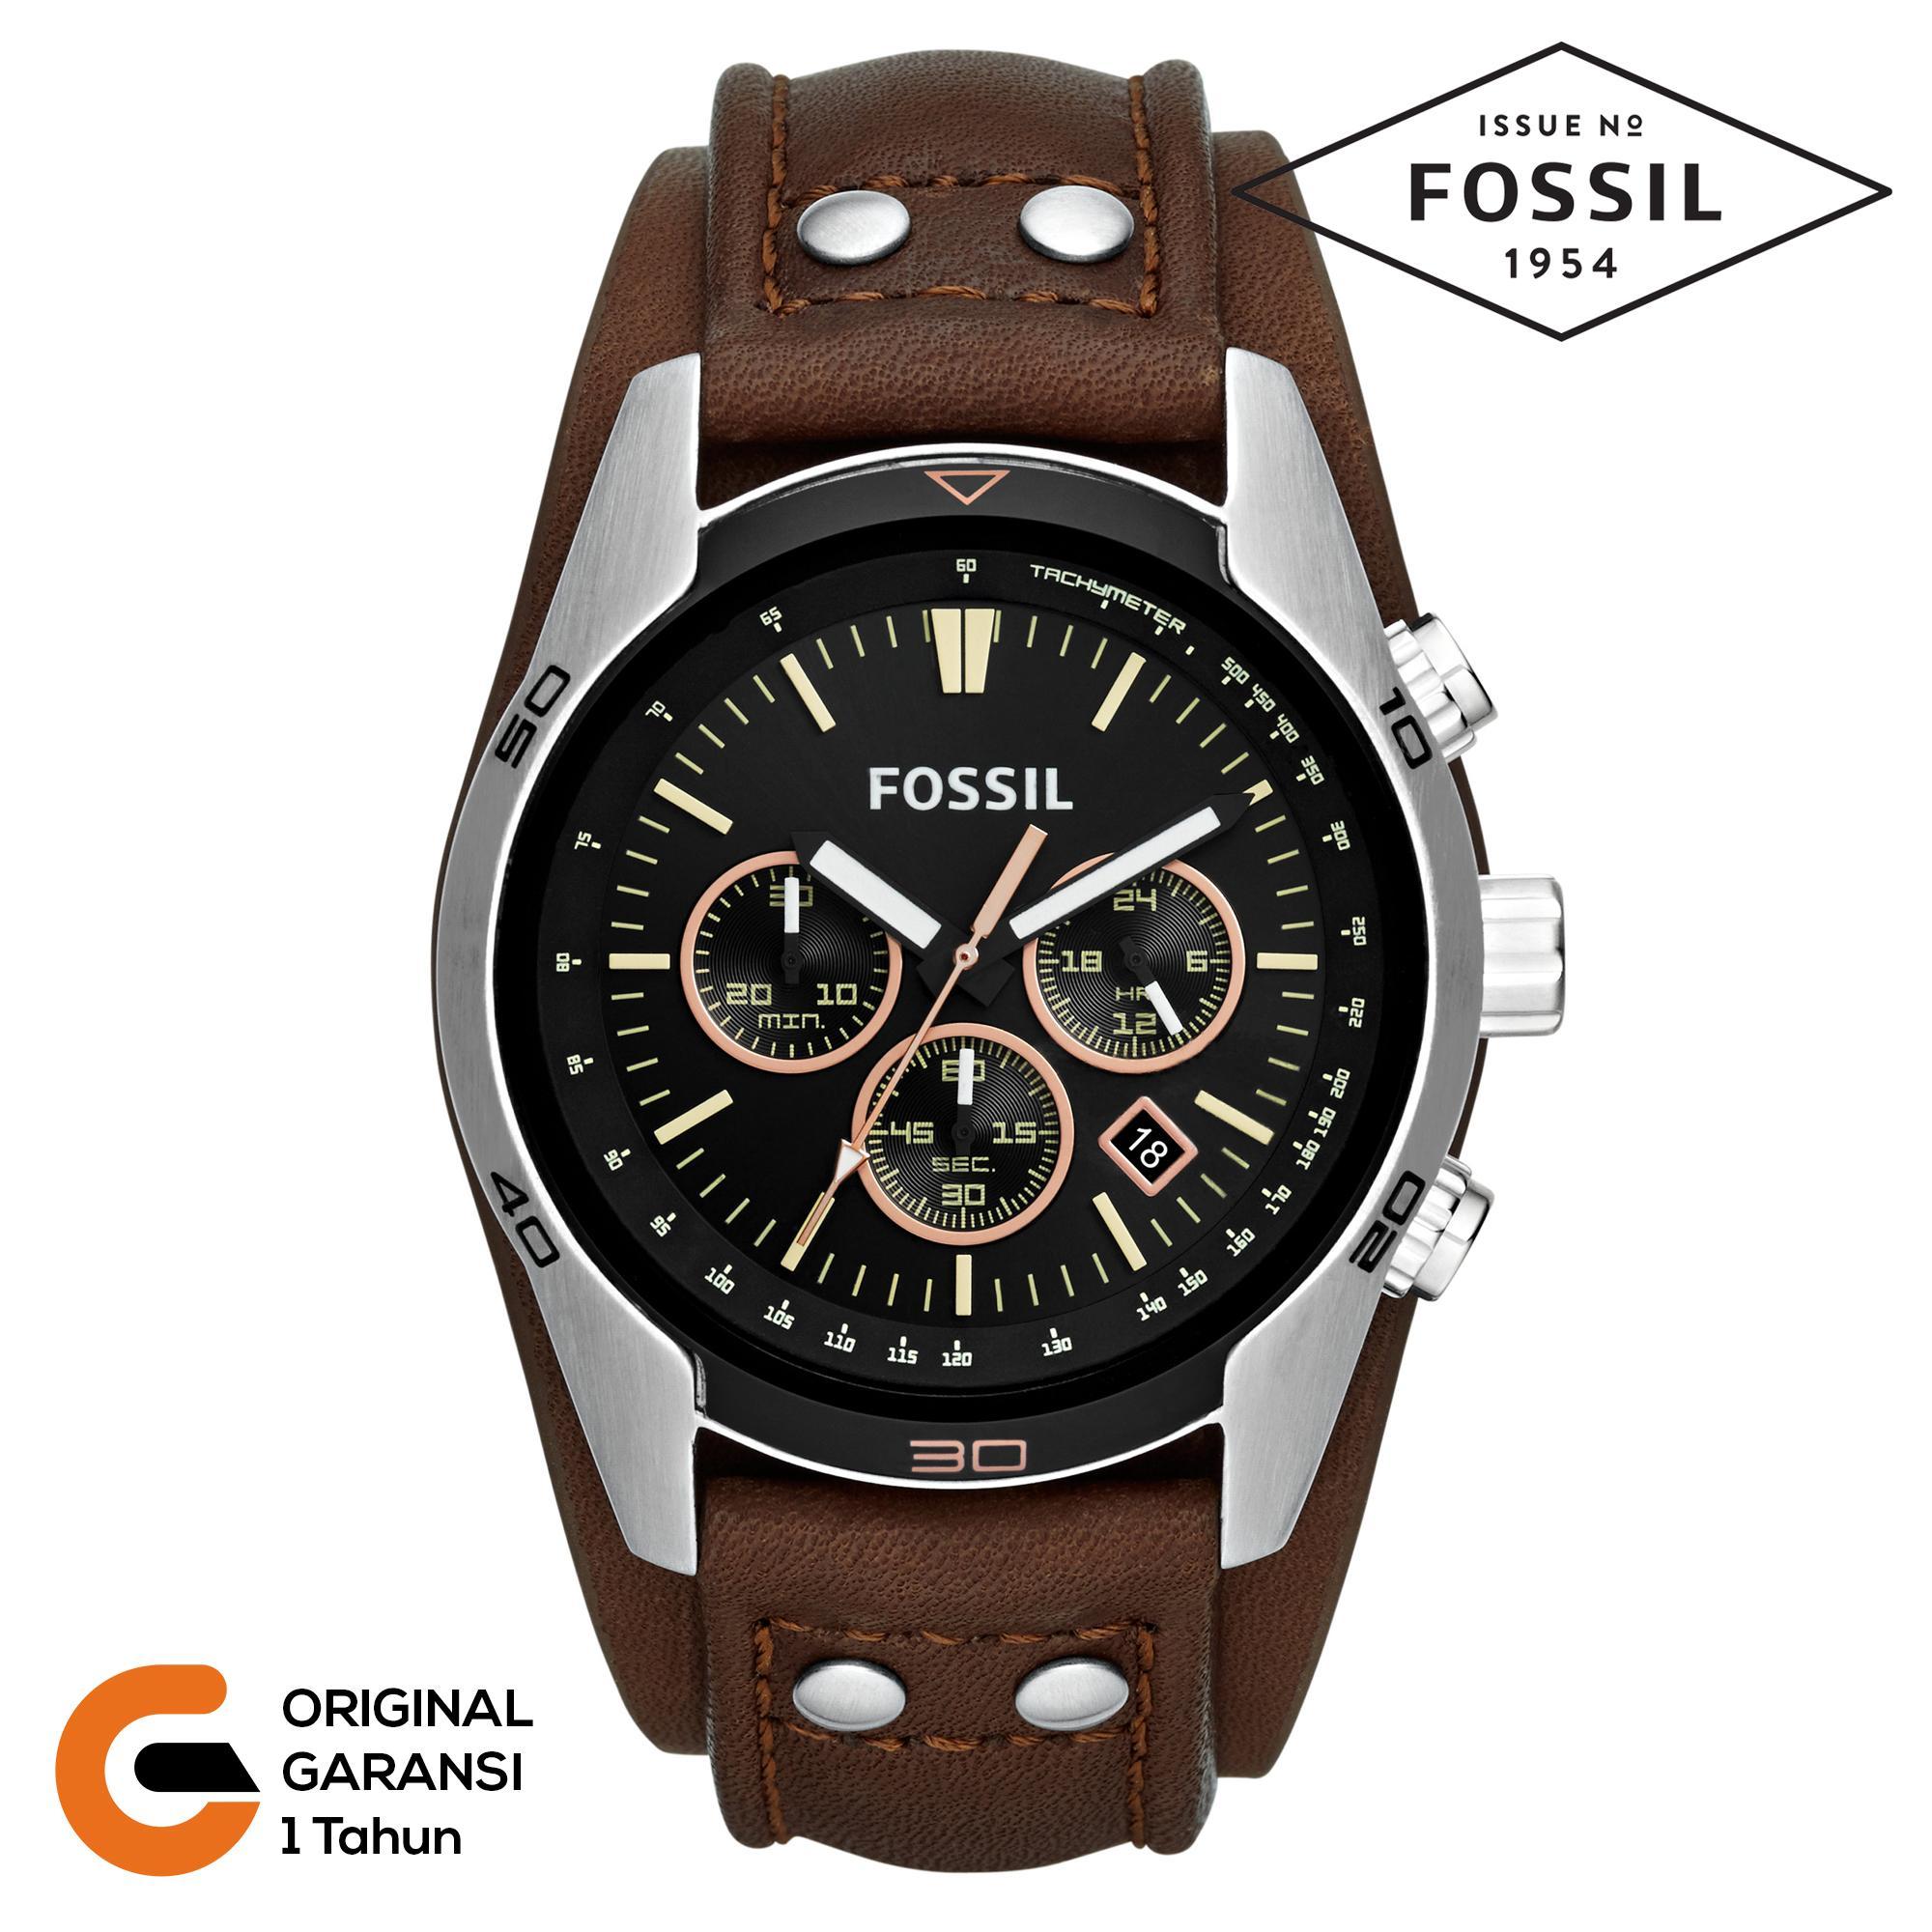 Fossil Jam Tangan Pria Fossil Coachman CH2565 CH2891 Jam Tangan Pria Anti Air Chronograph Tali